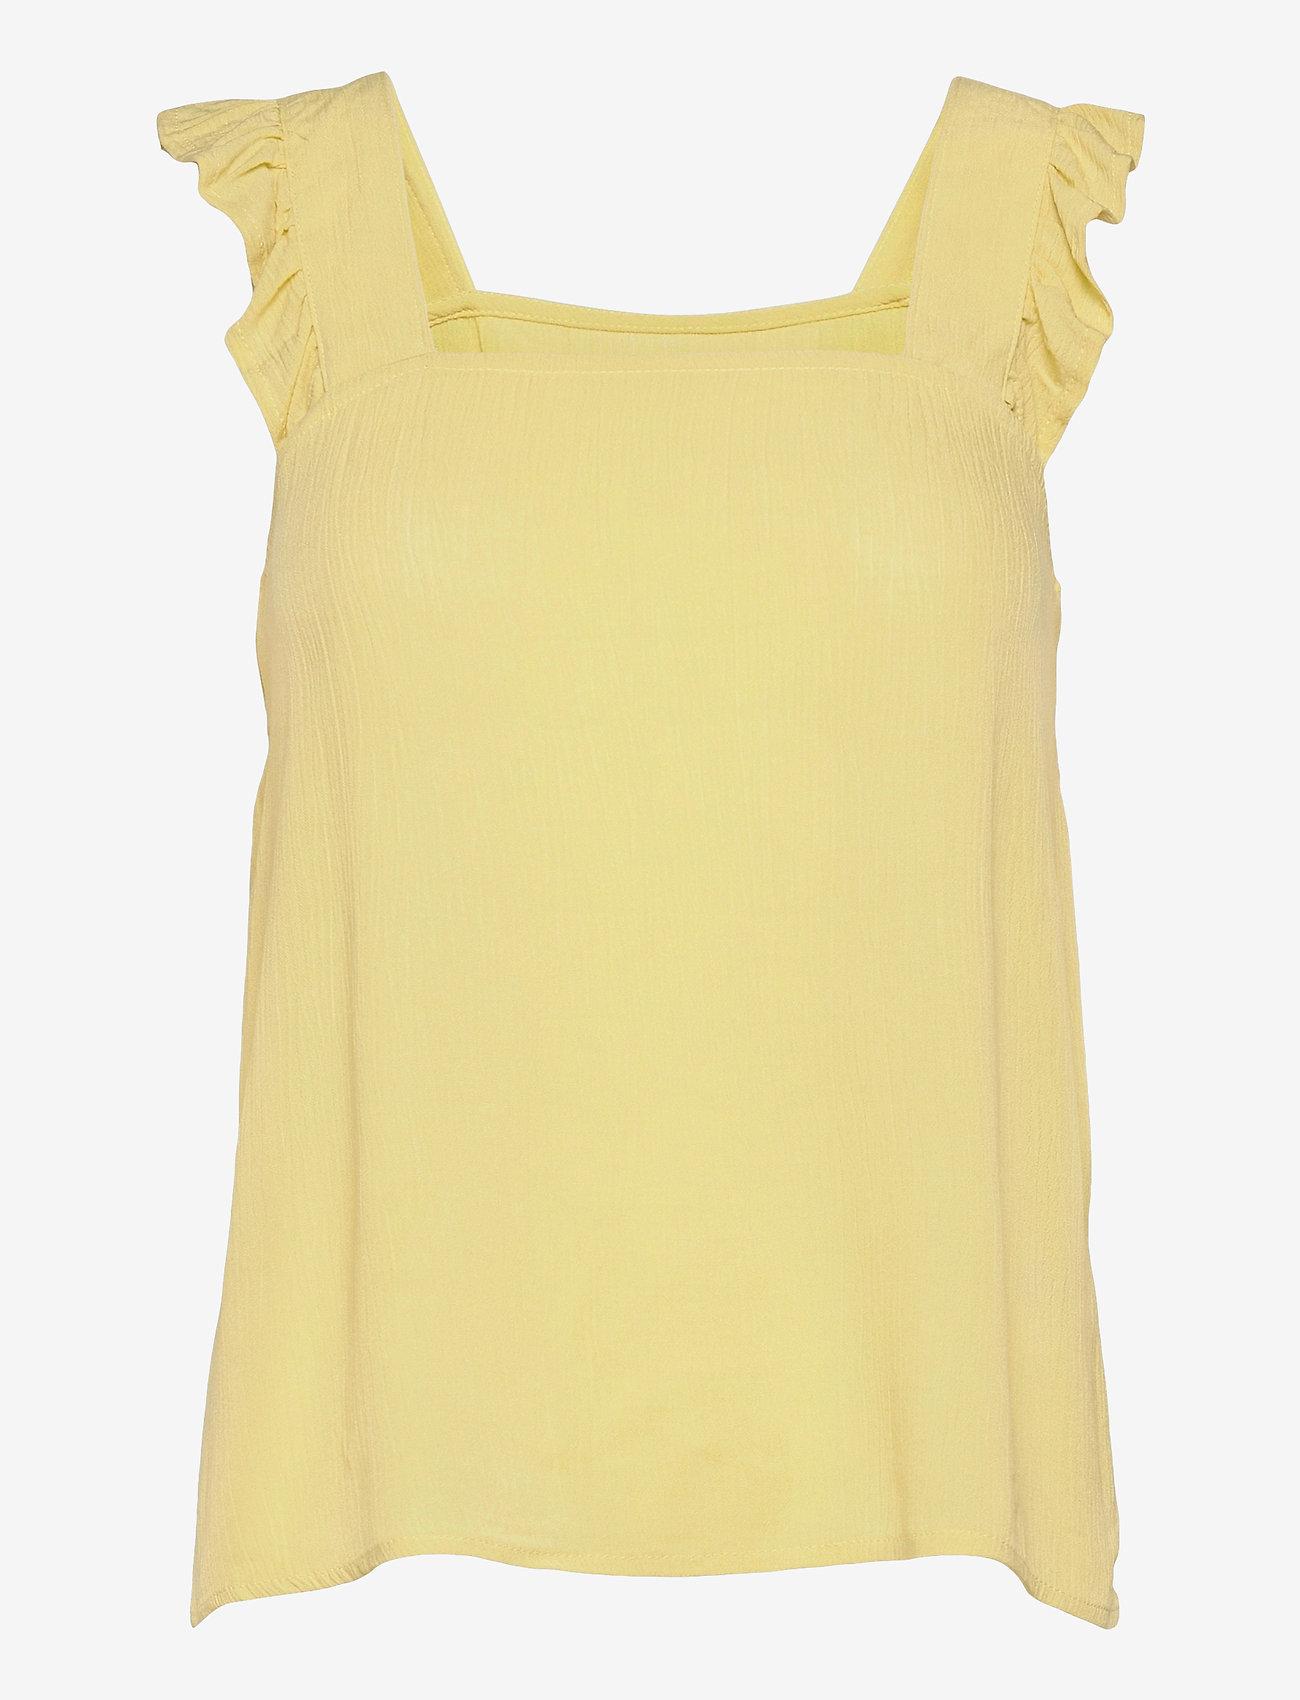 ICHI - IHMARRAKECH SO TO2 - sleeveless blouses - golden mist - 0